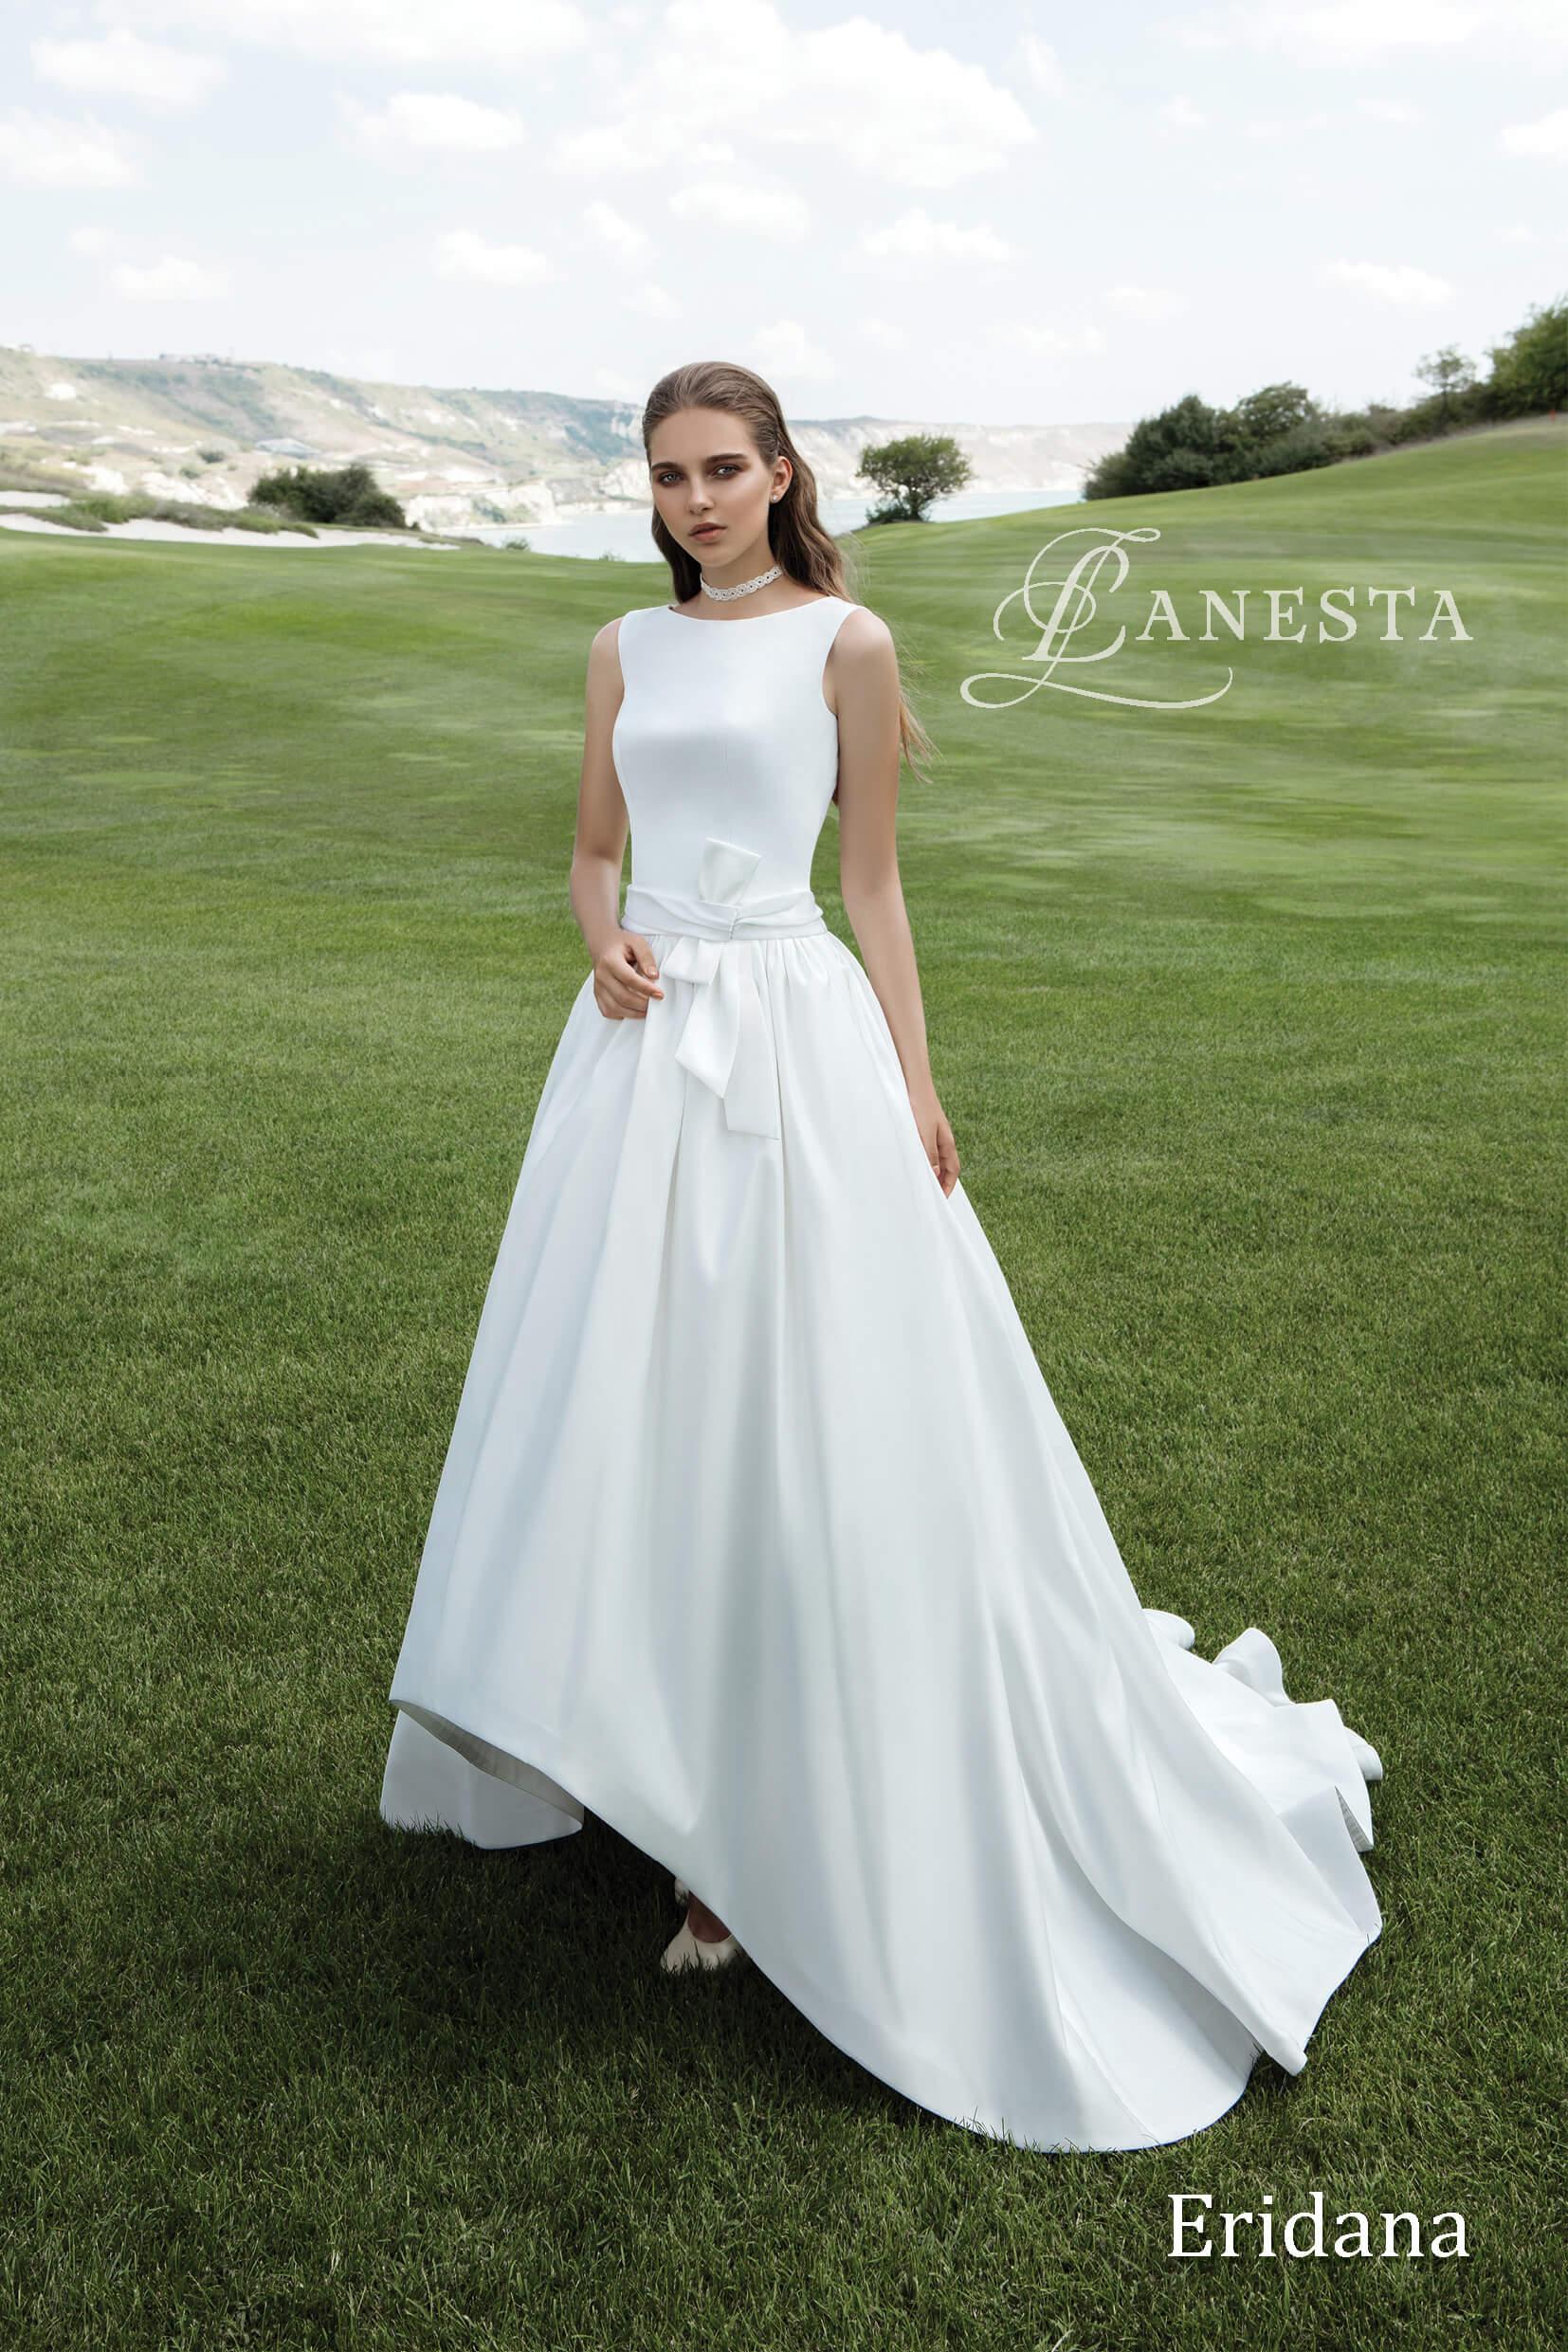 Весільна сукня Eridana Lanesta